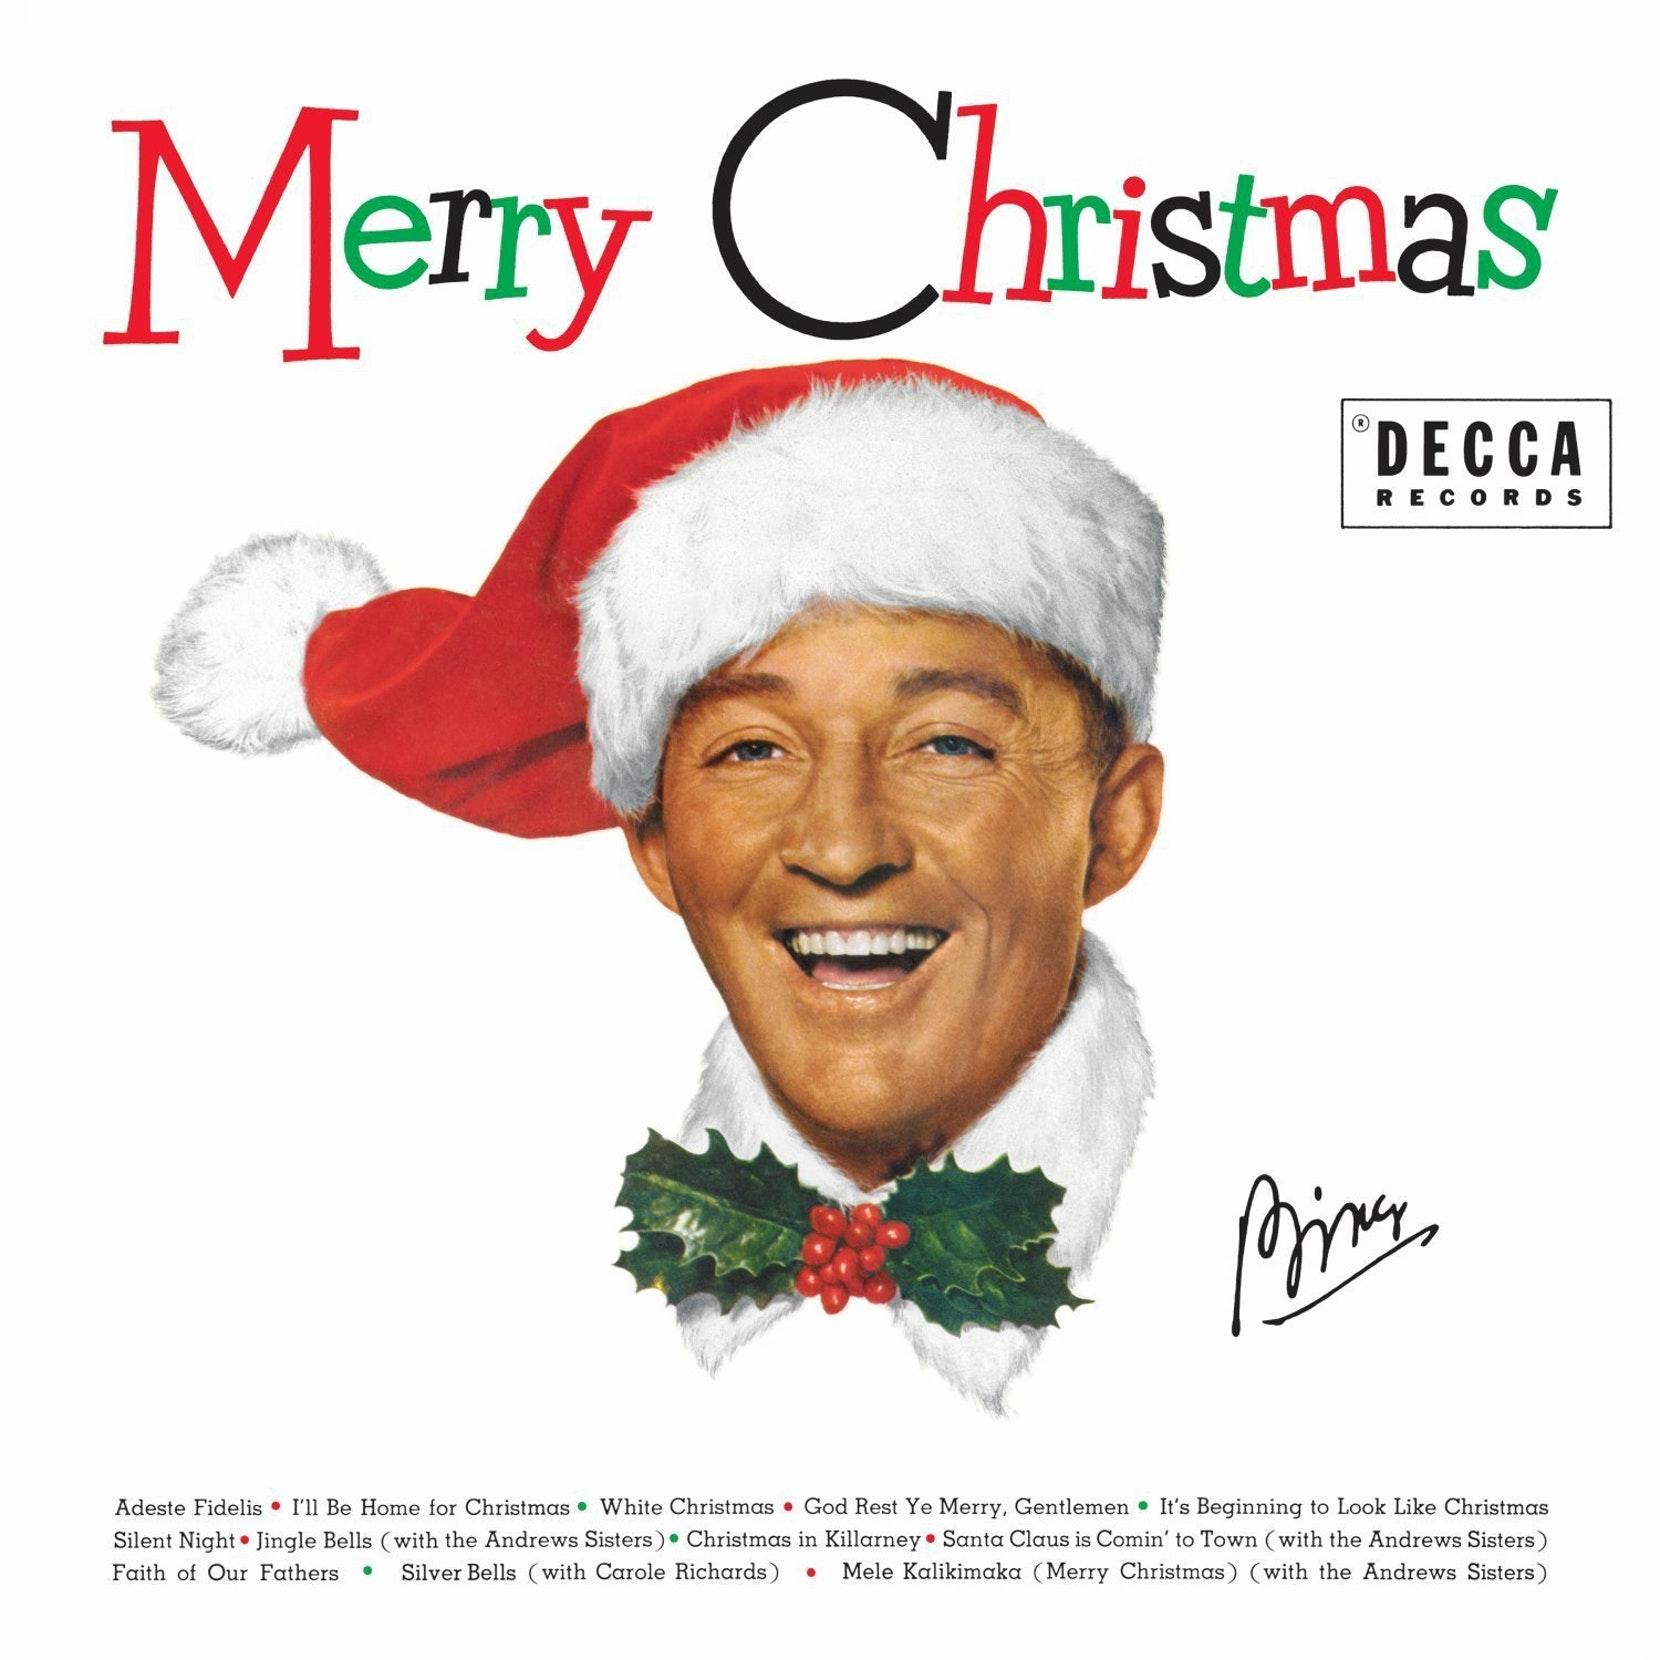 tinhte_christmas_giang_sinh_vinyl_album (4).jpg